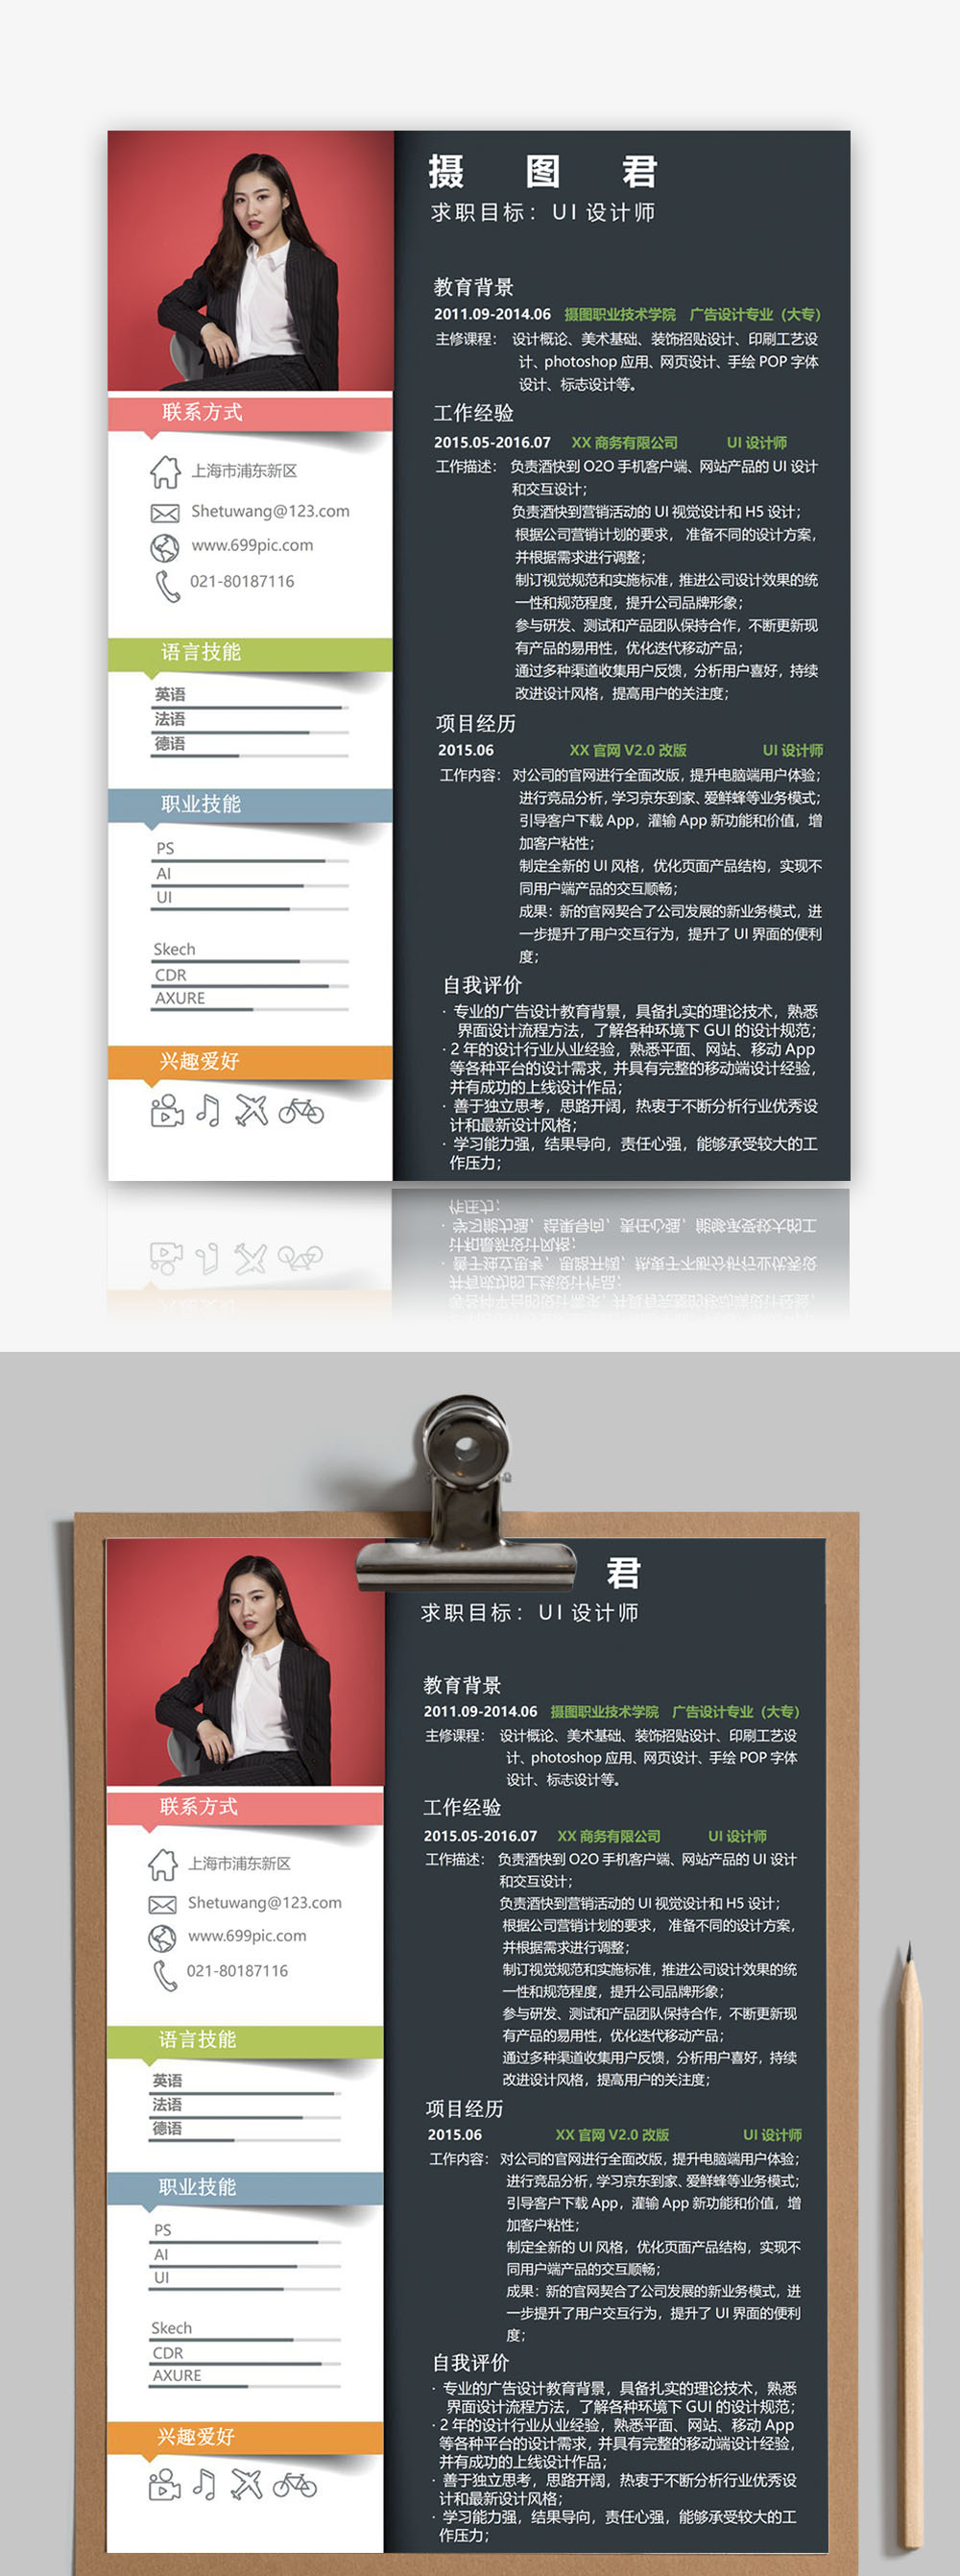 UI设计师个人简历word模板图片